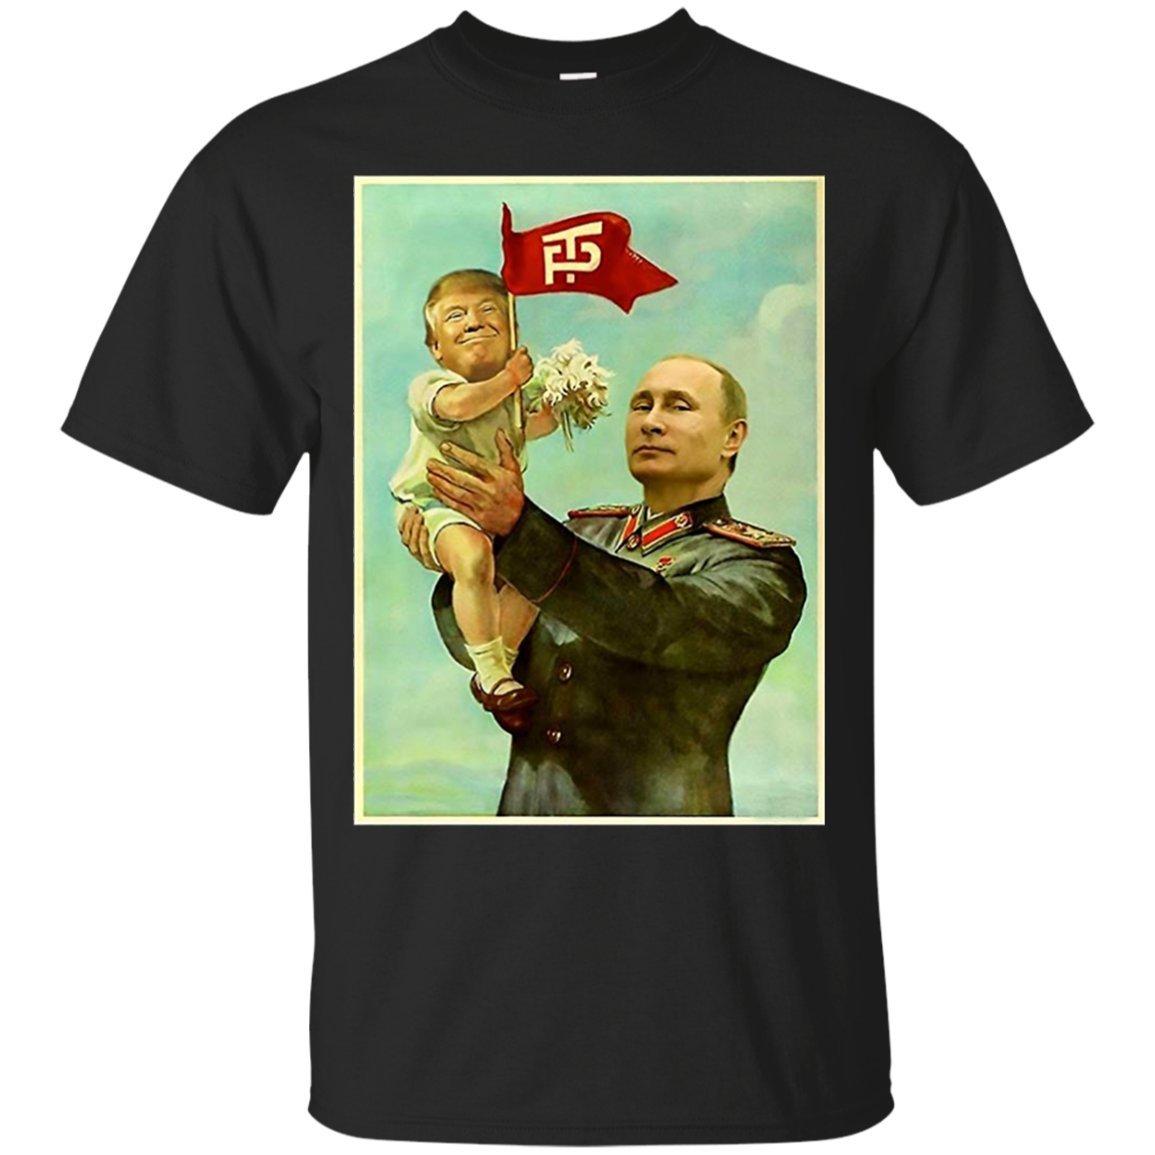 Tee4you Funny Baby Trump Putin 2017 T Shirt 7886